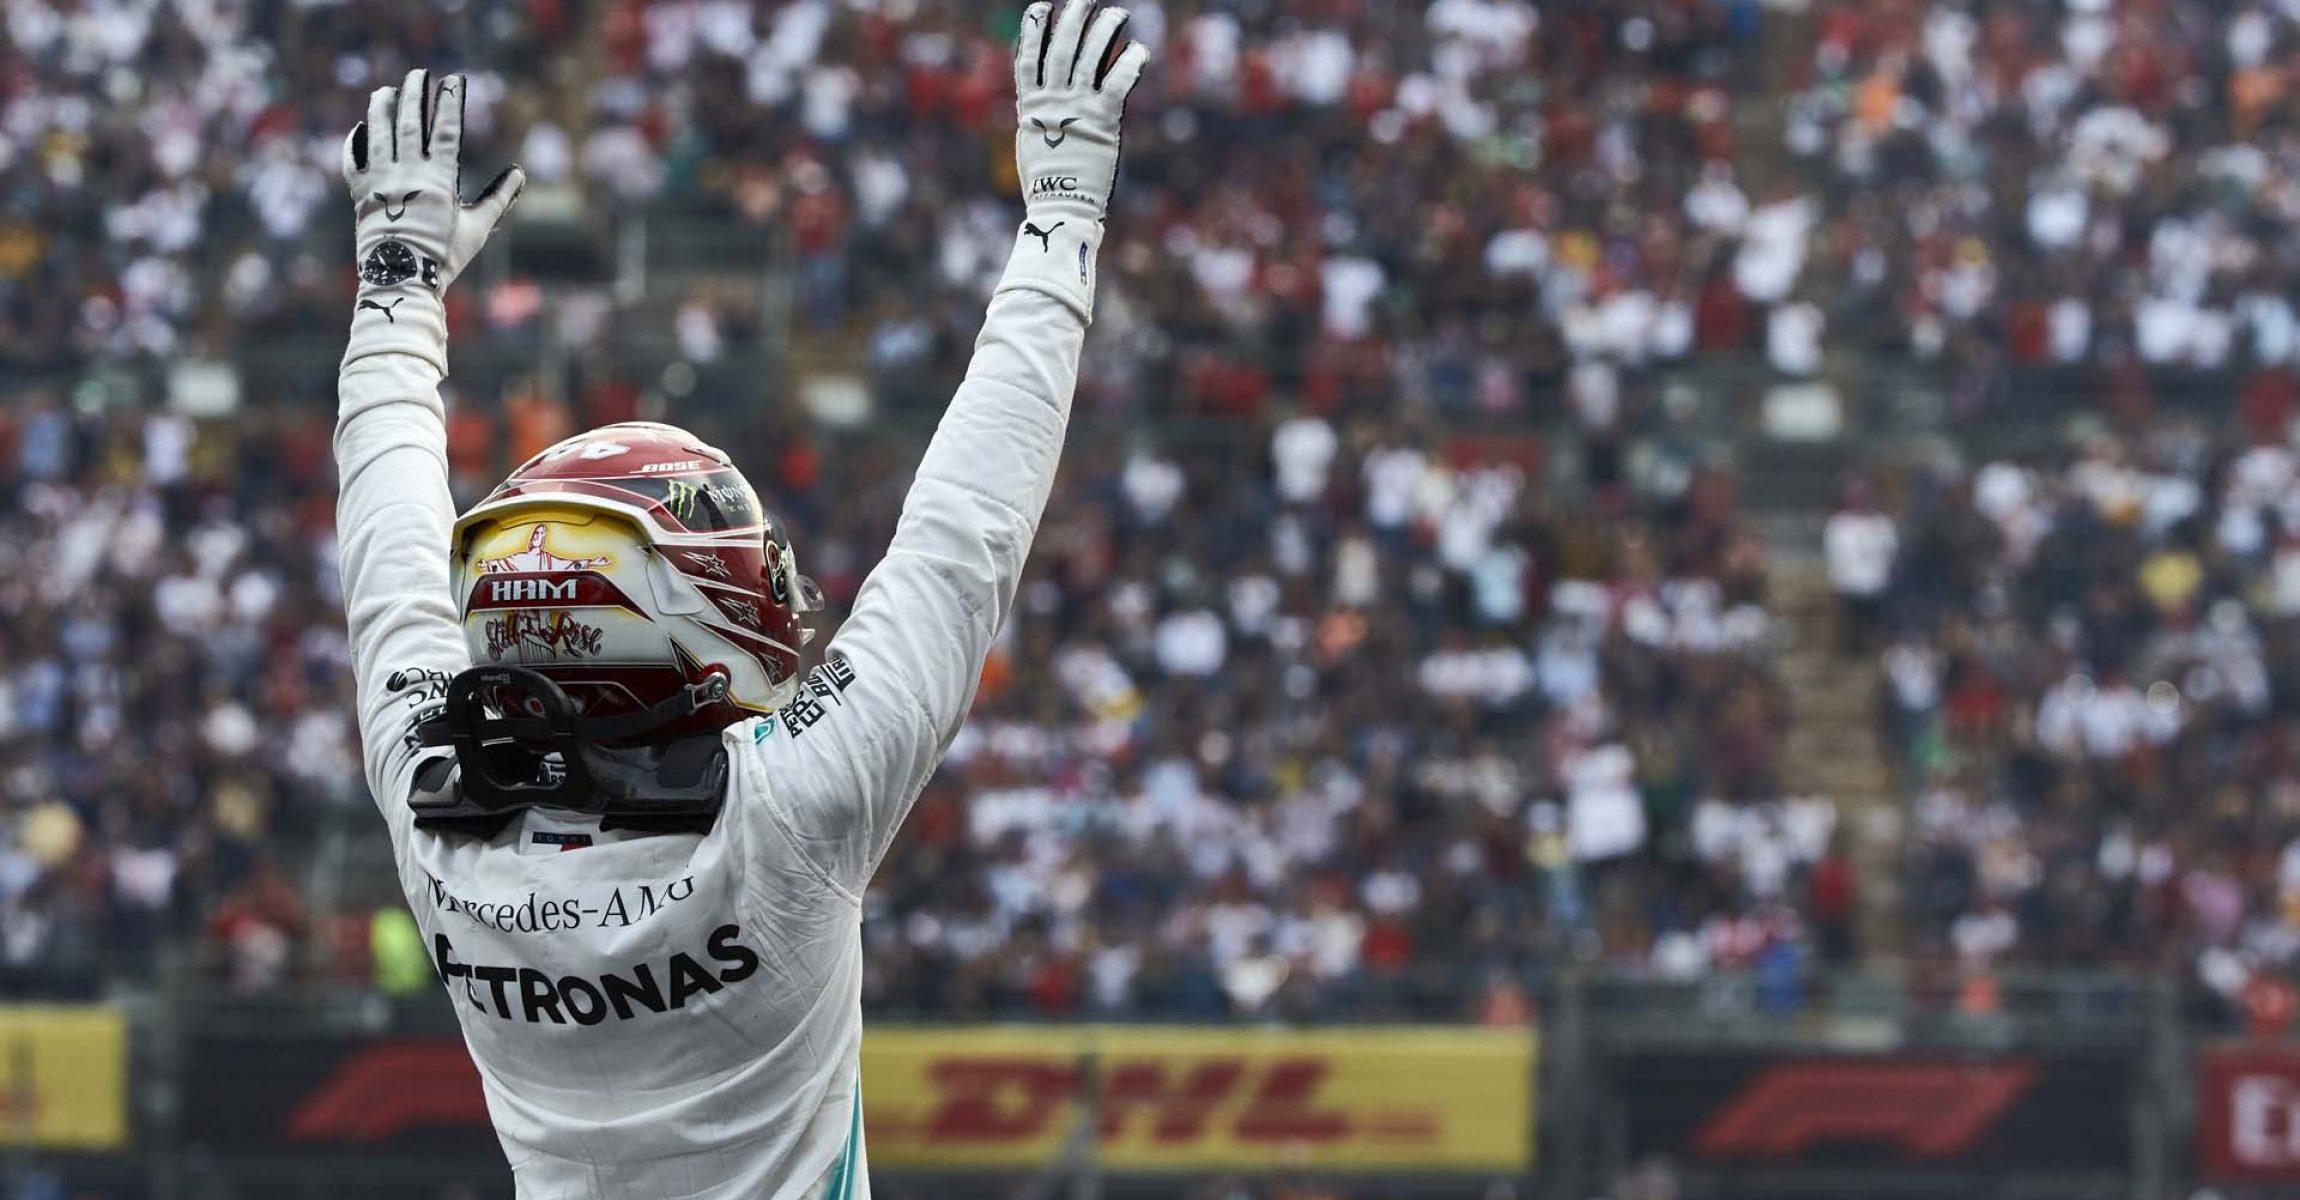 2019 Mexican Grand Prix, Sunday - Steve Etherington Lewis Hamilton Mercedes